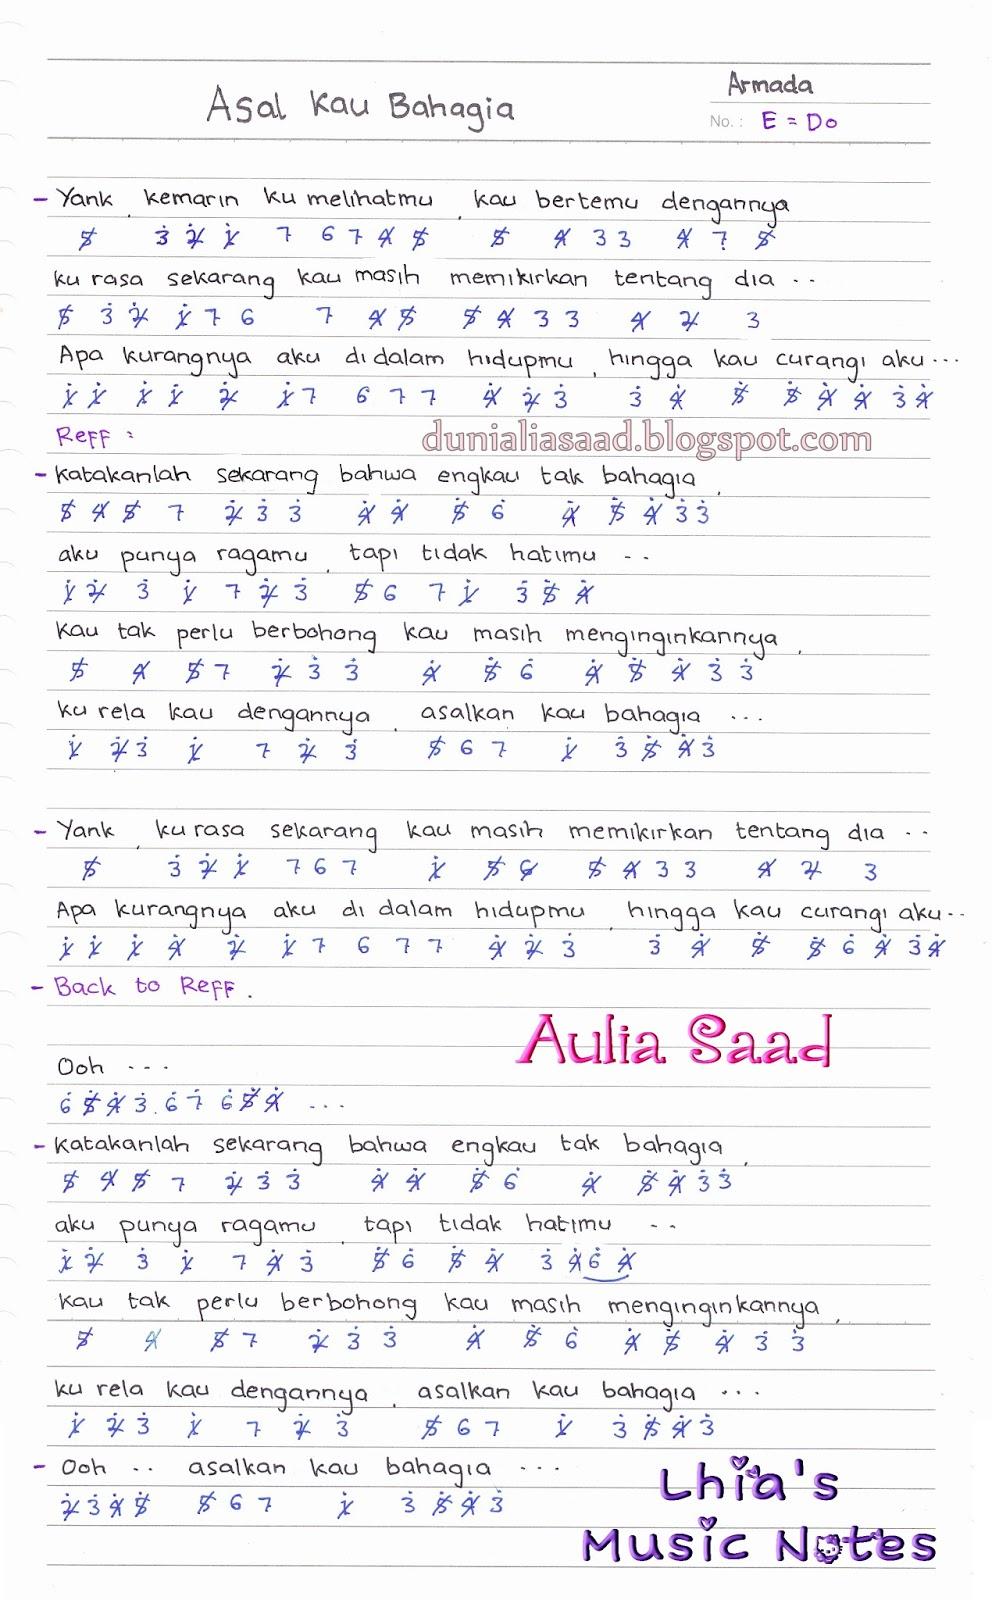 not angka : armada - asal kau bahagia | aulia's world